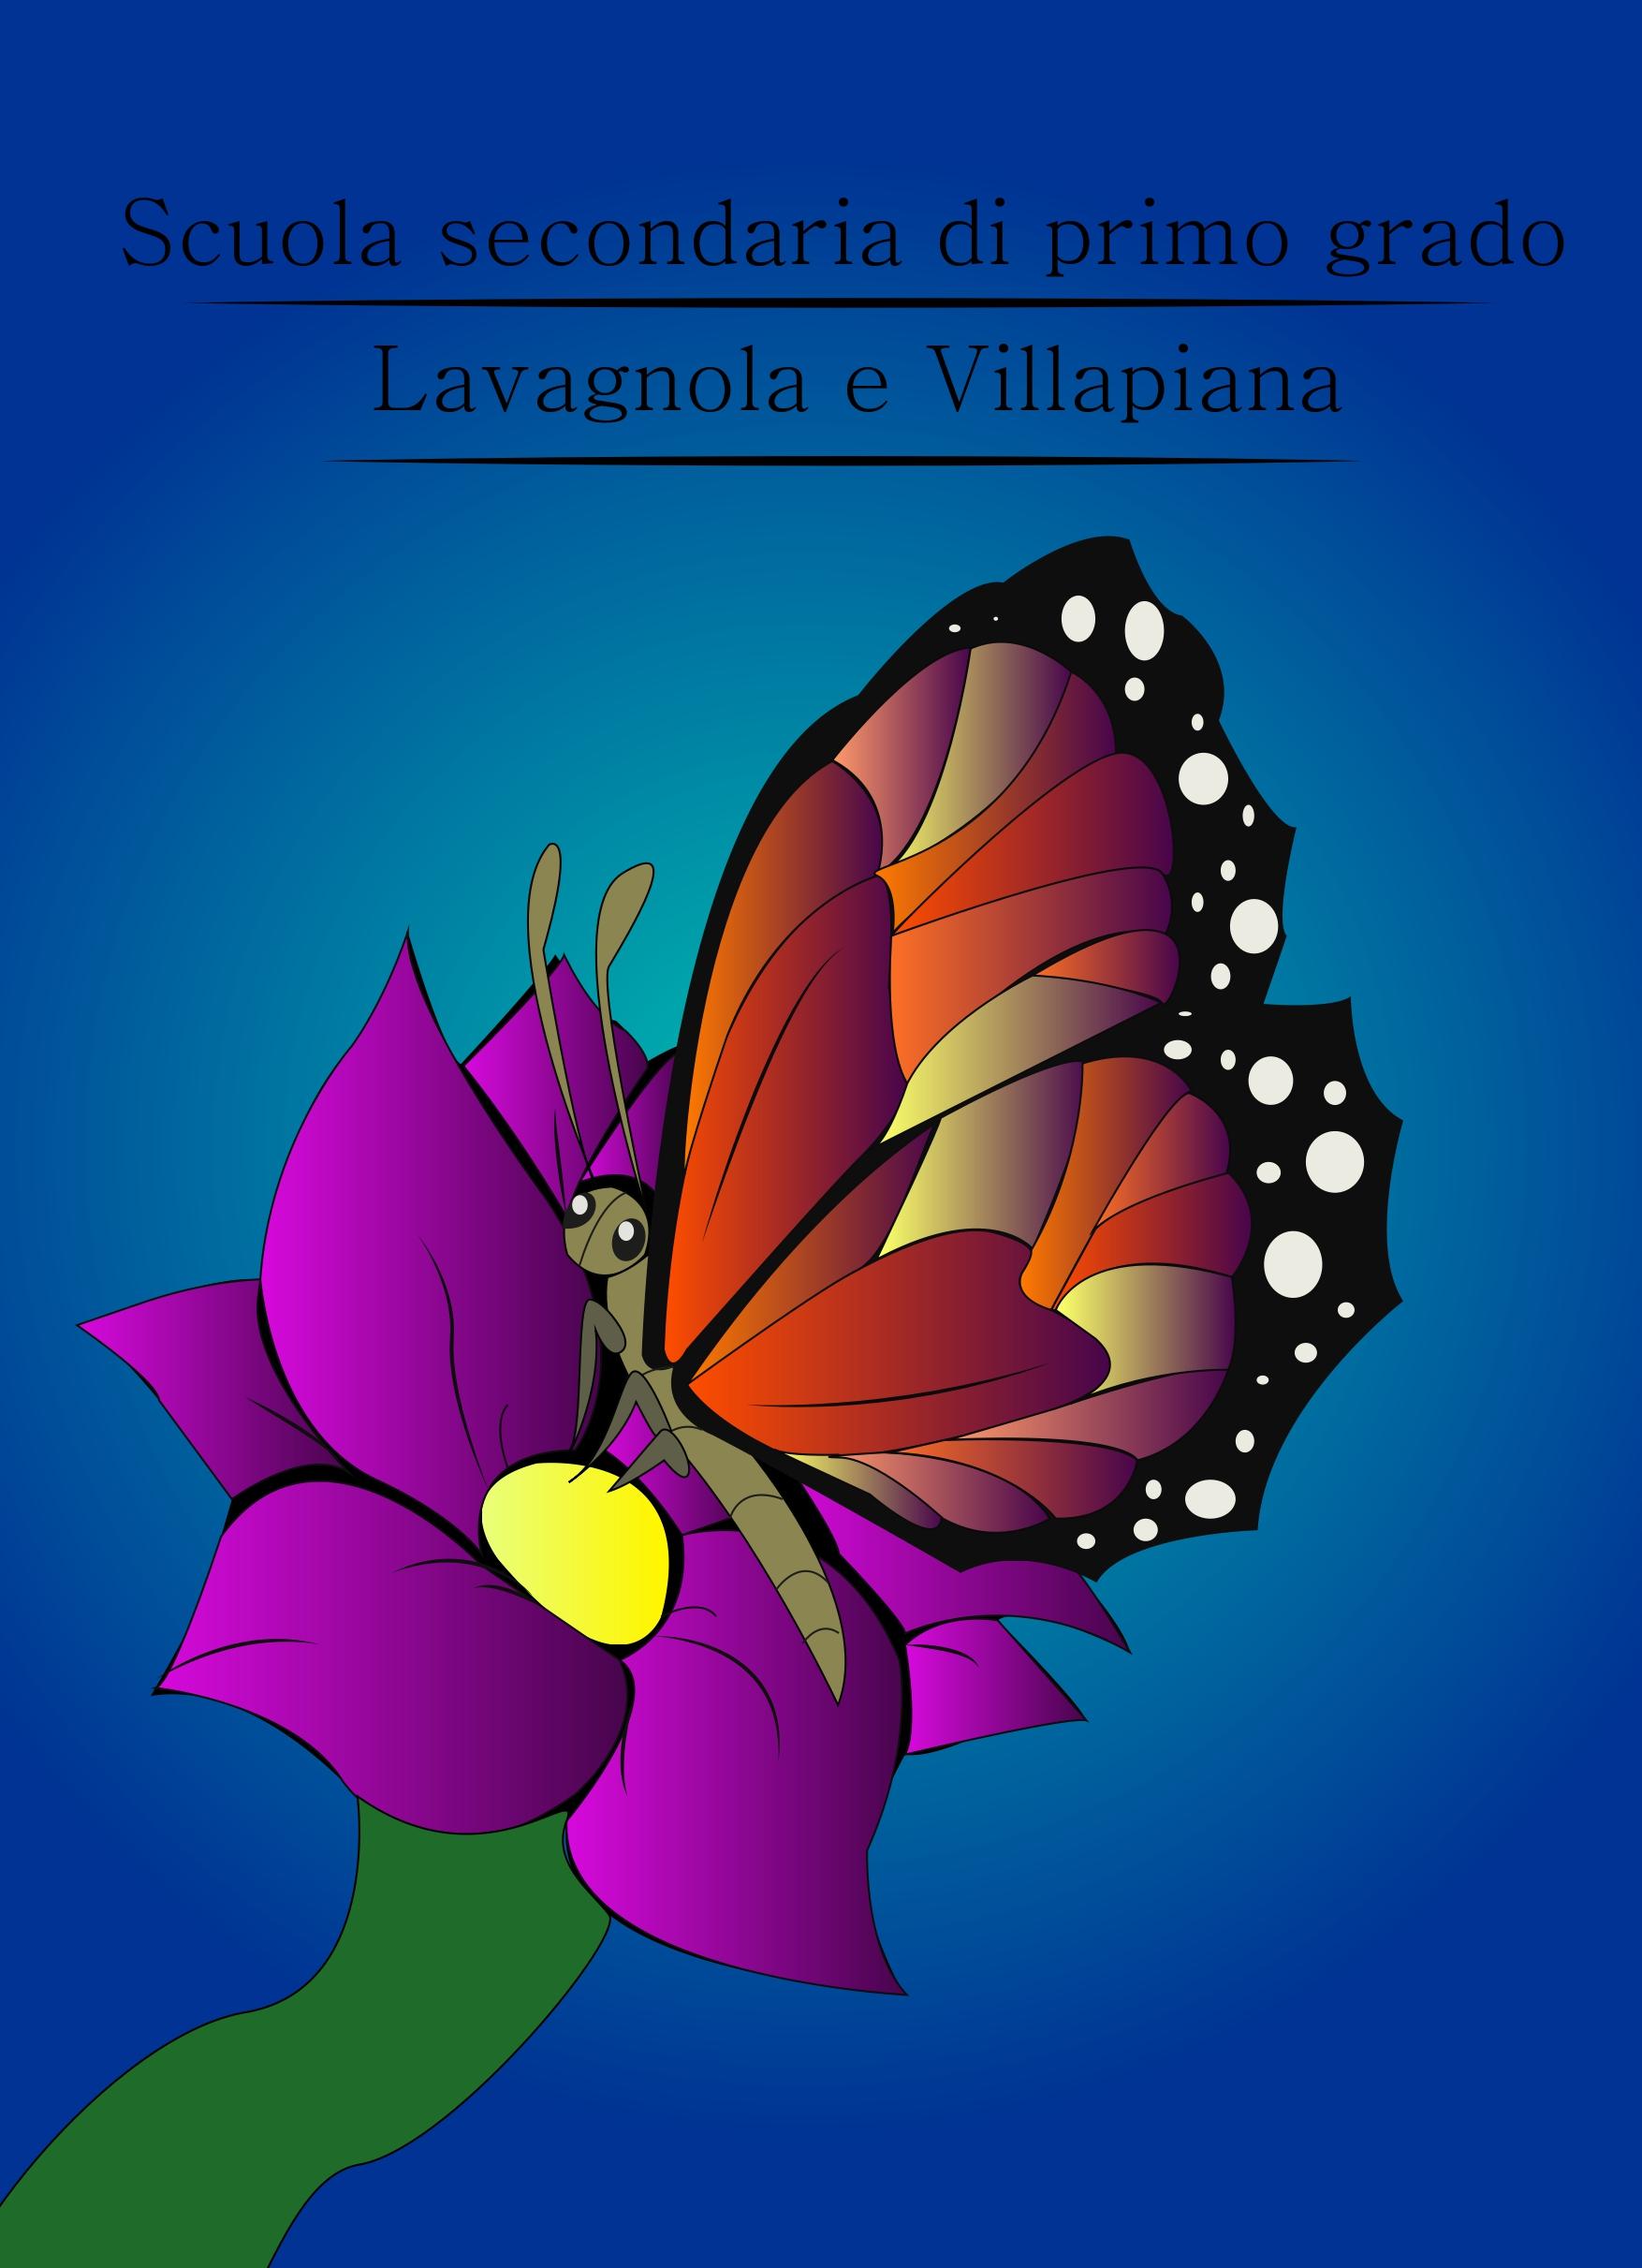 Logo Scuola Secondaria primo Grado Lavagnola e Villapiana